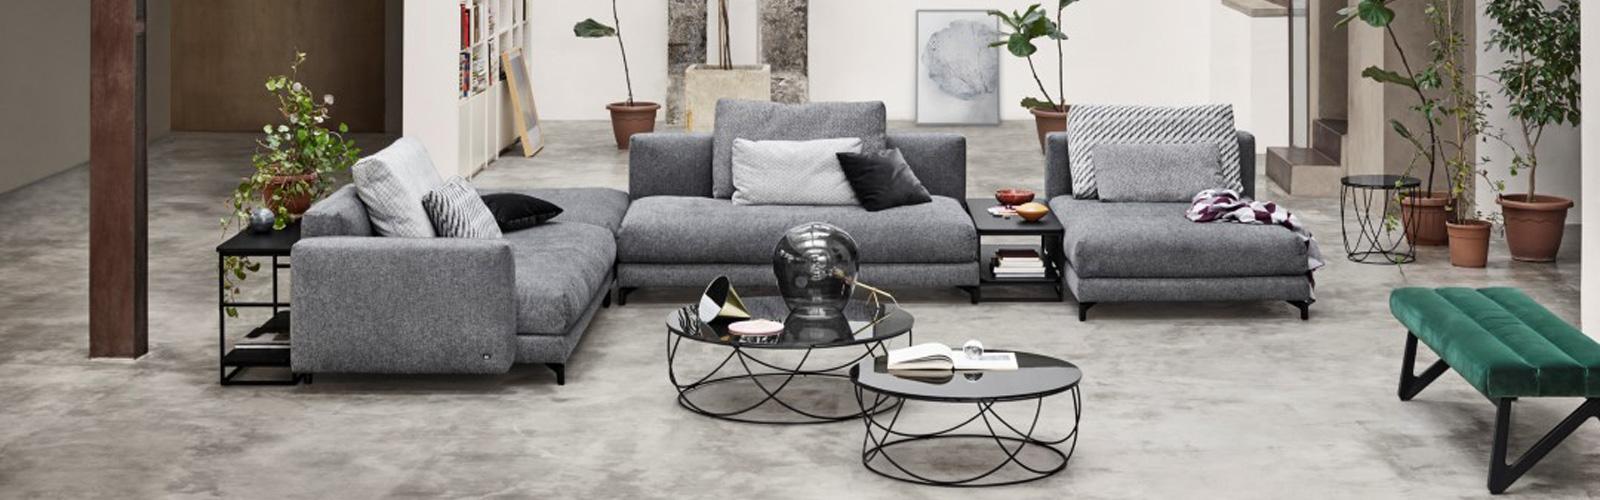 Rolf Benz Sofa's